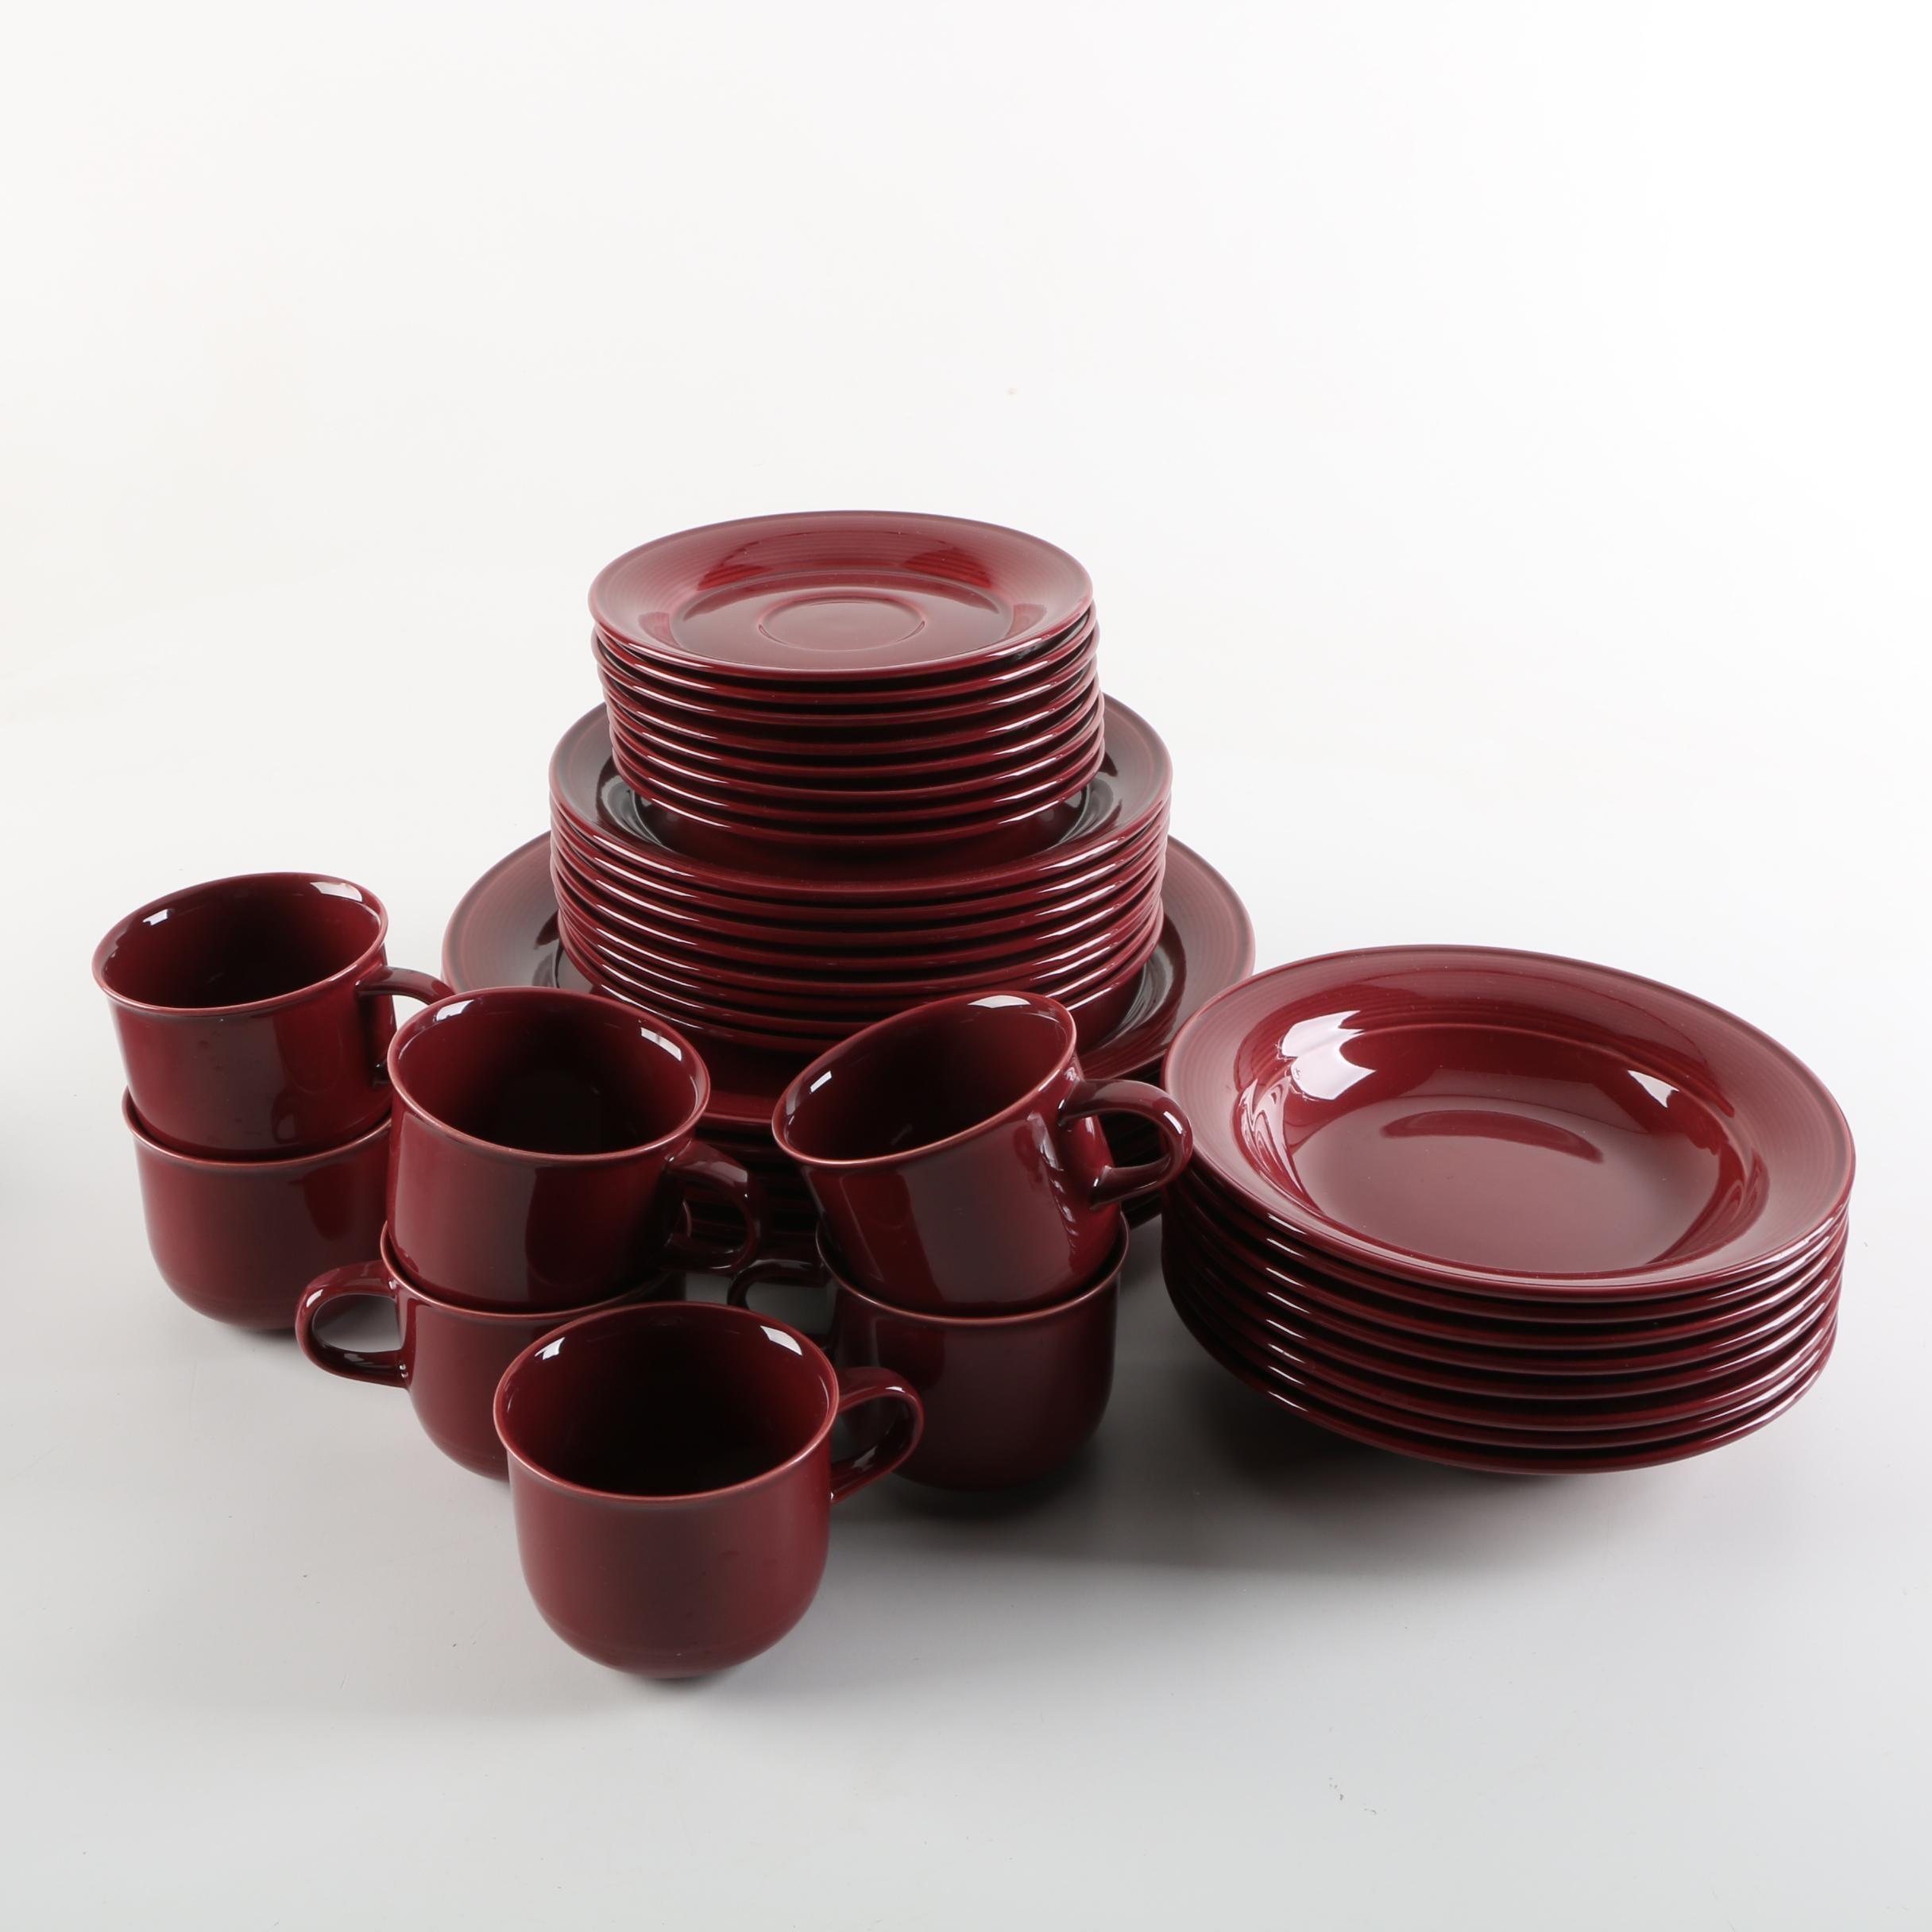 Nancy Calhoun \ Raspberry\  Stoneware Dishes ... & Nancy Calhoun \